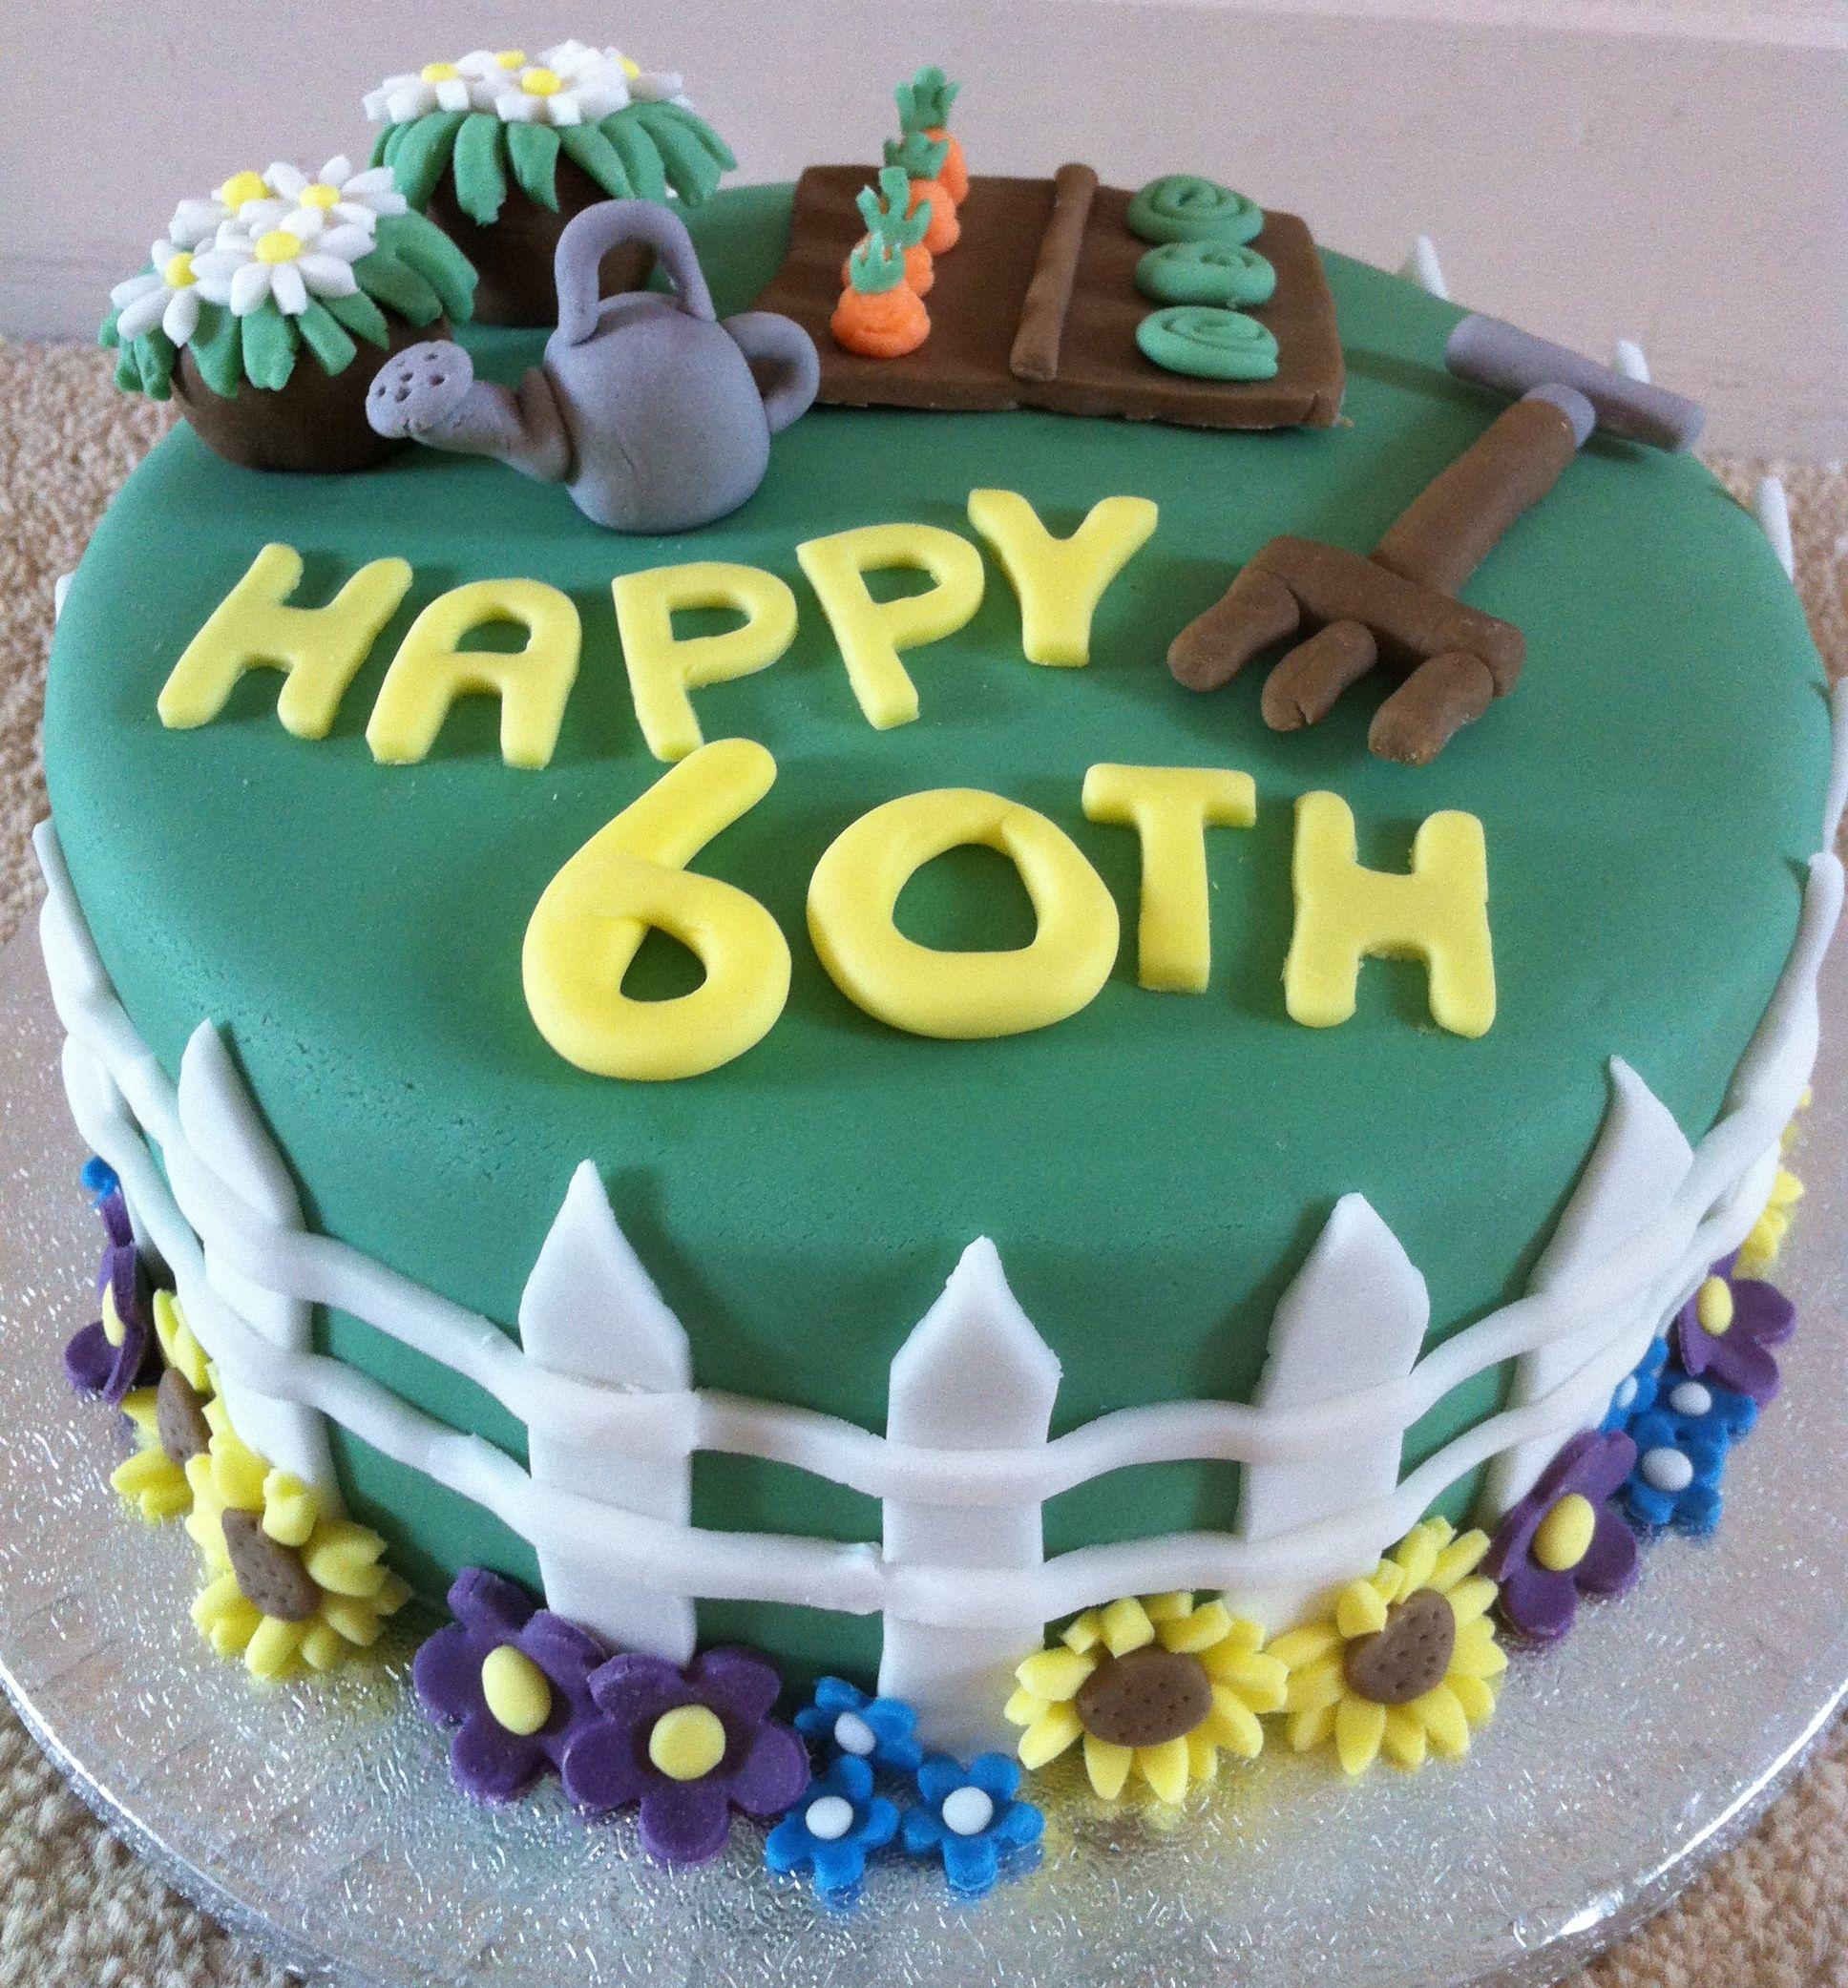 60th Birthday Gardening Cake Cake Ideas Pinterest